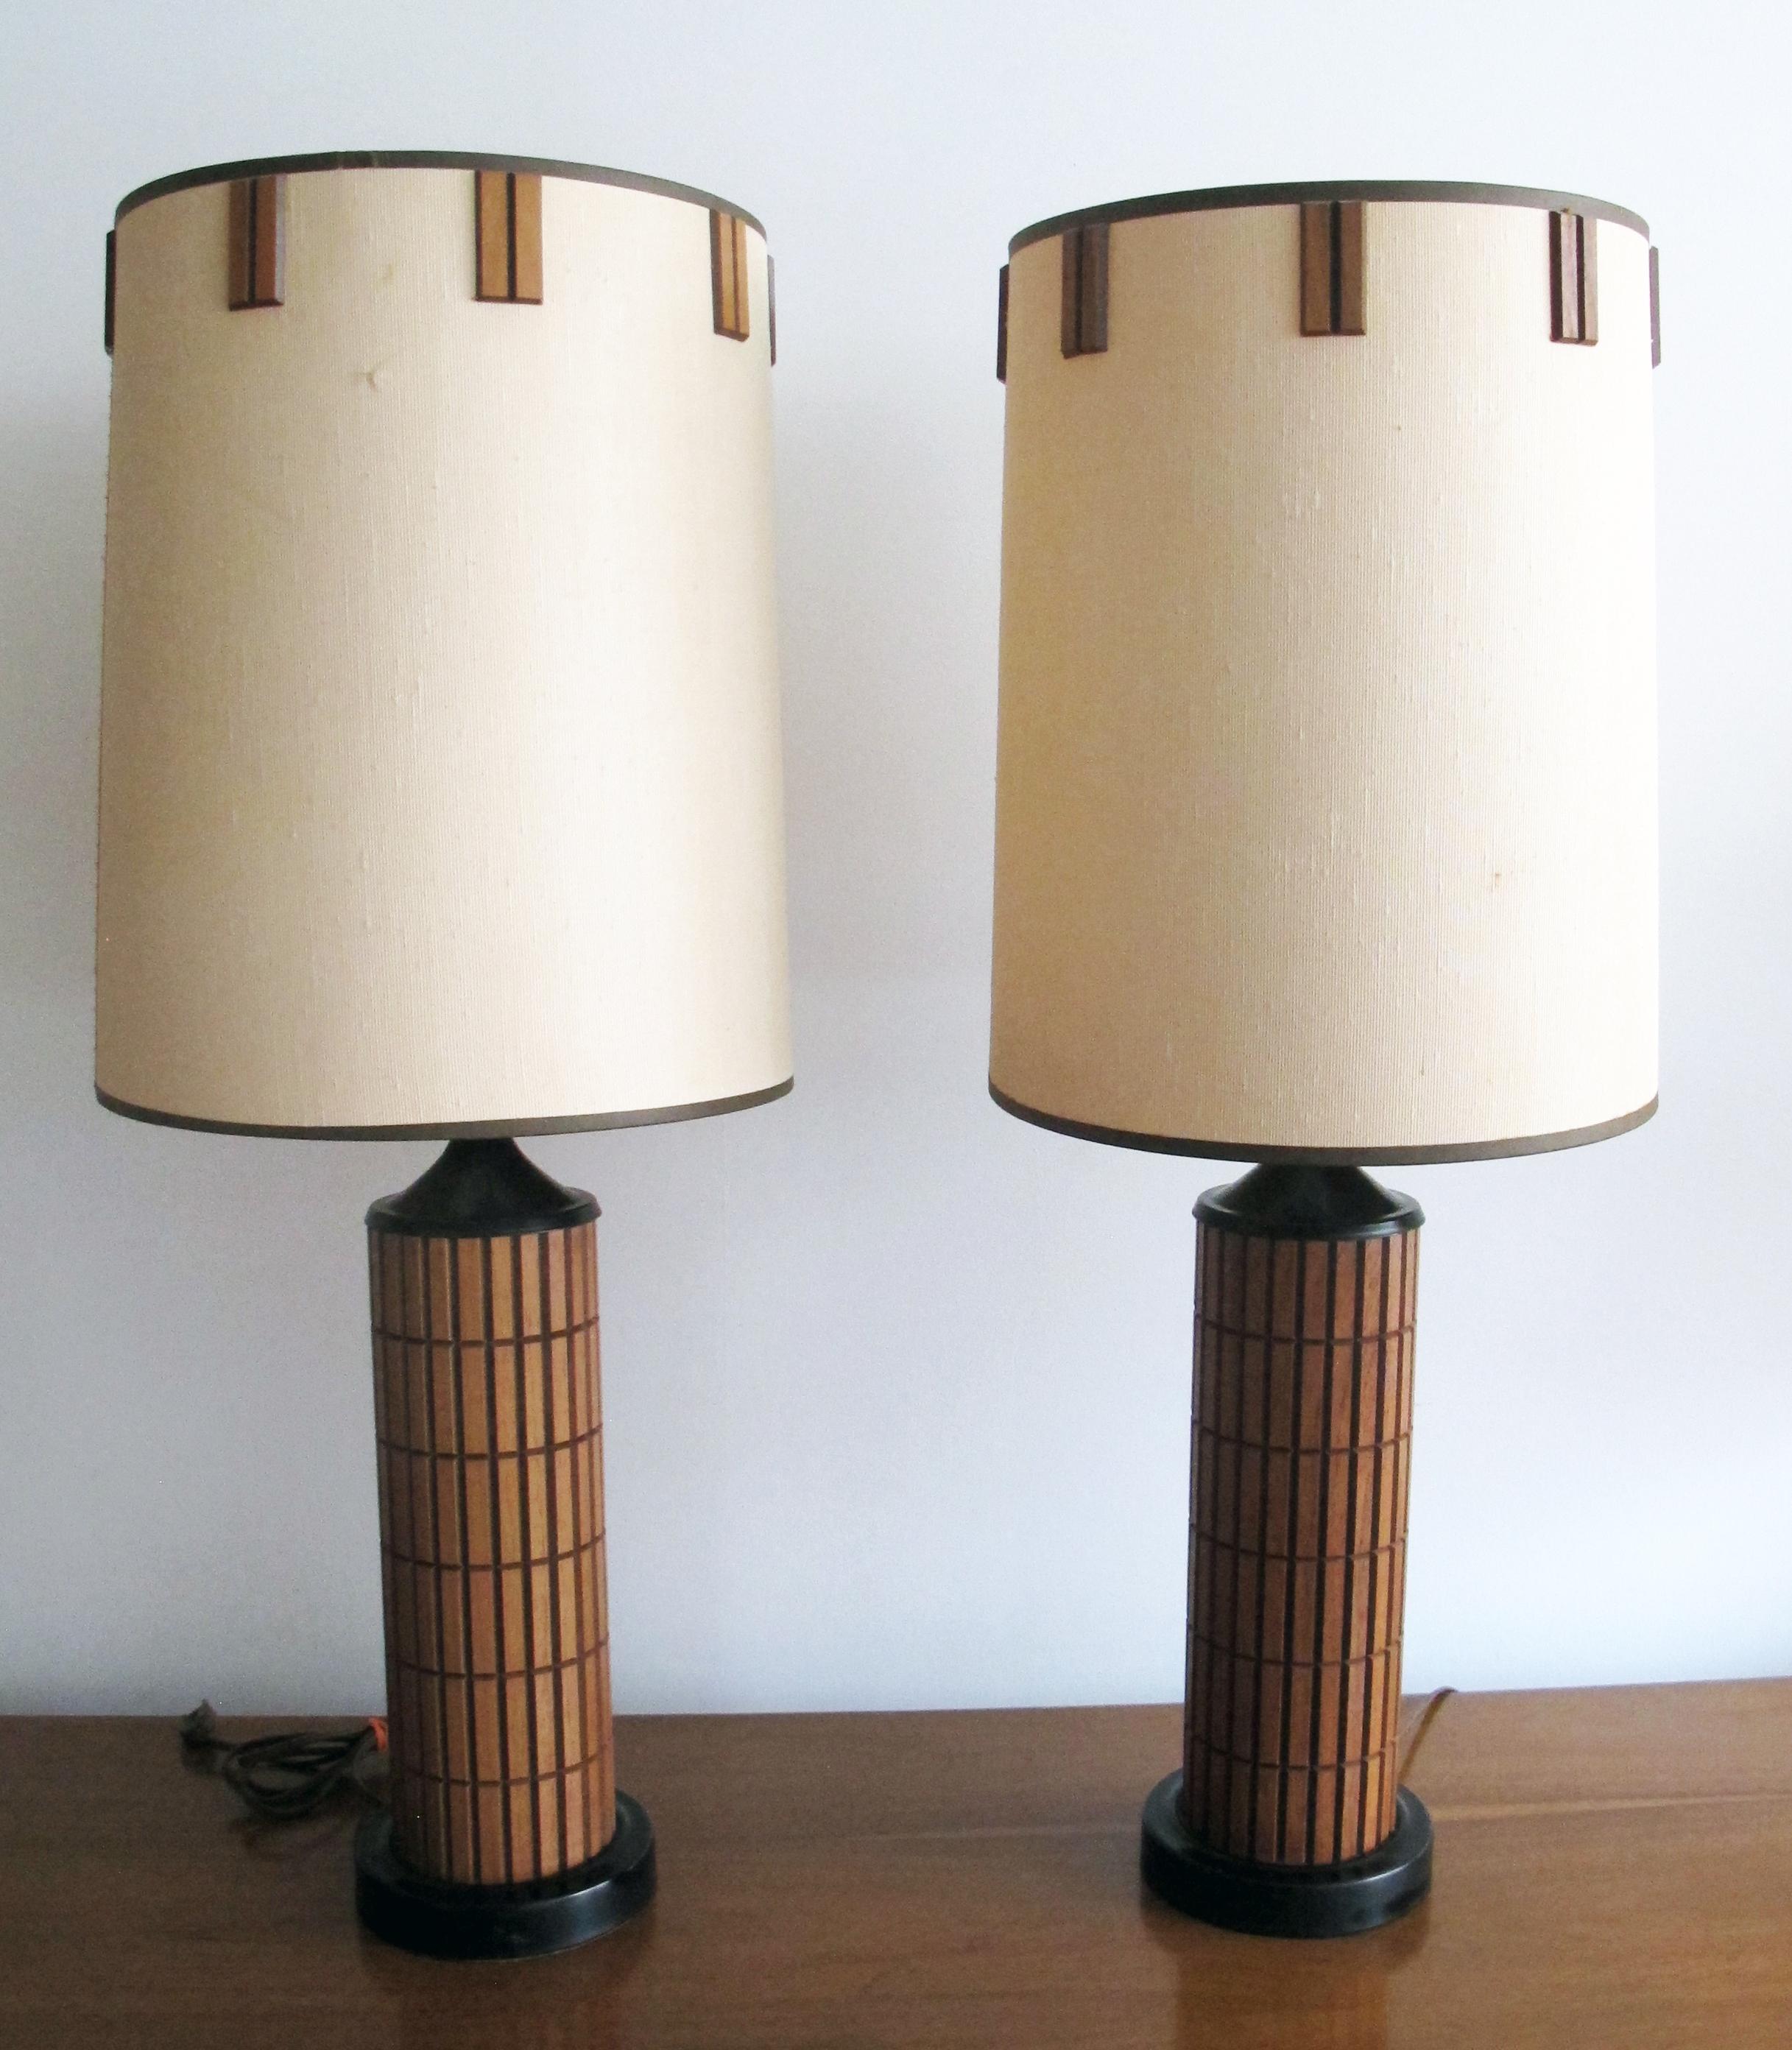 MID CENTURY MODERN WALNUT WOOD LAMPS